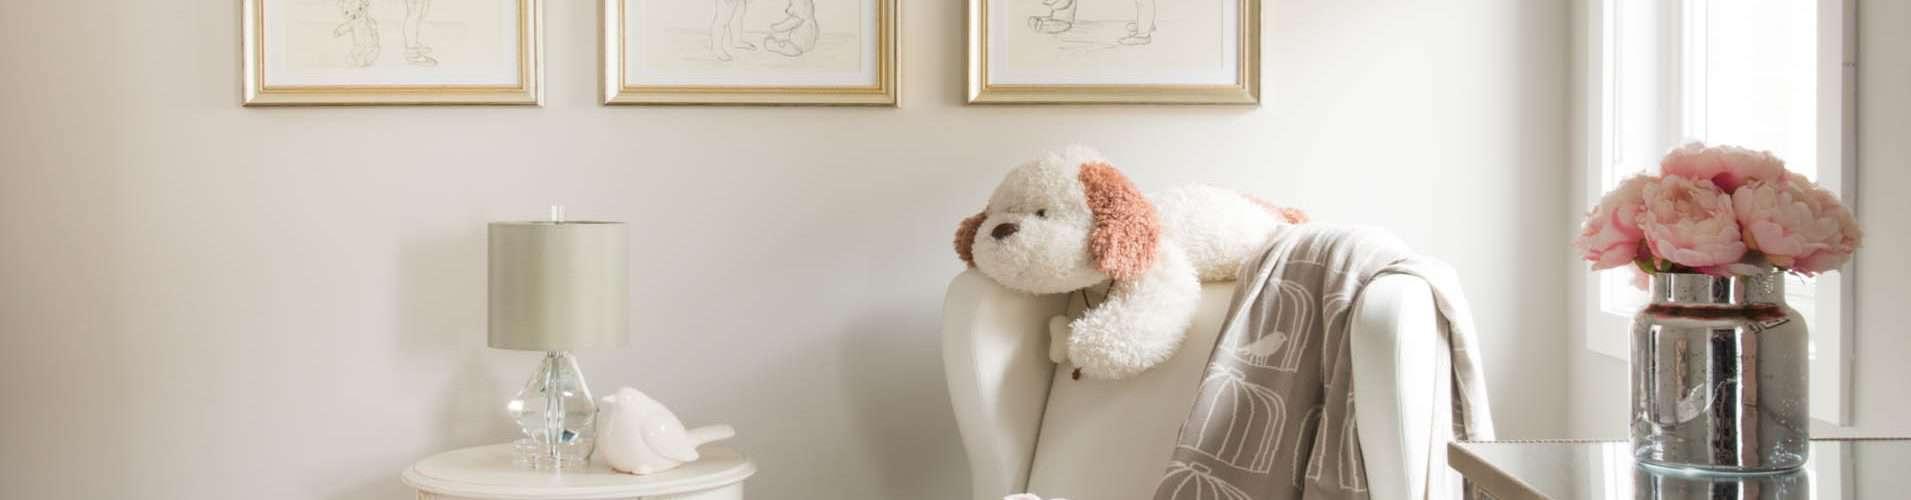 Nursery Design Trends Advice From Celebrity Designer: Designer Space: Pretty In Pink Nursery